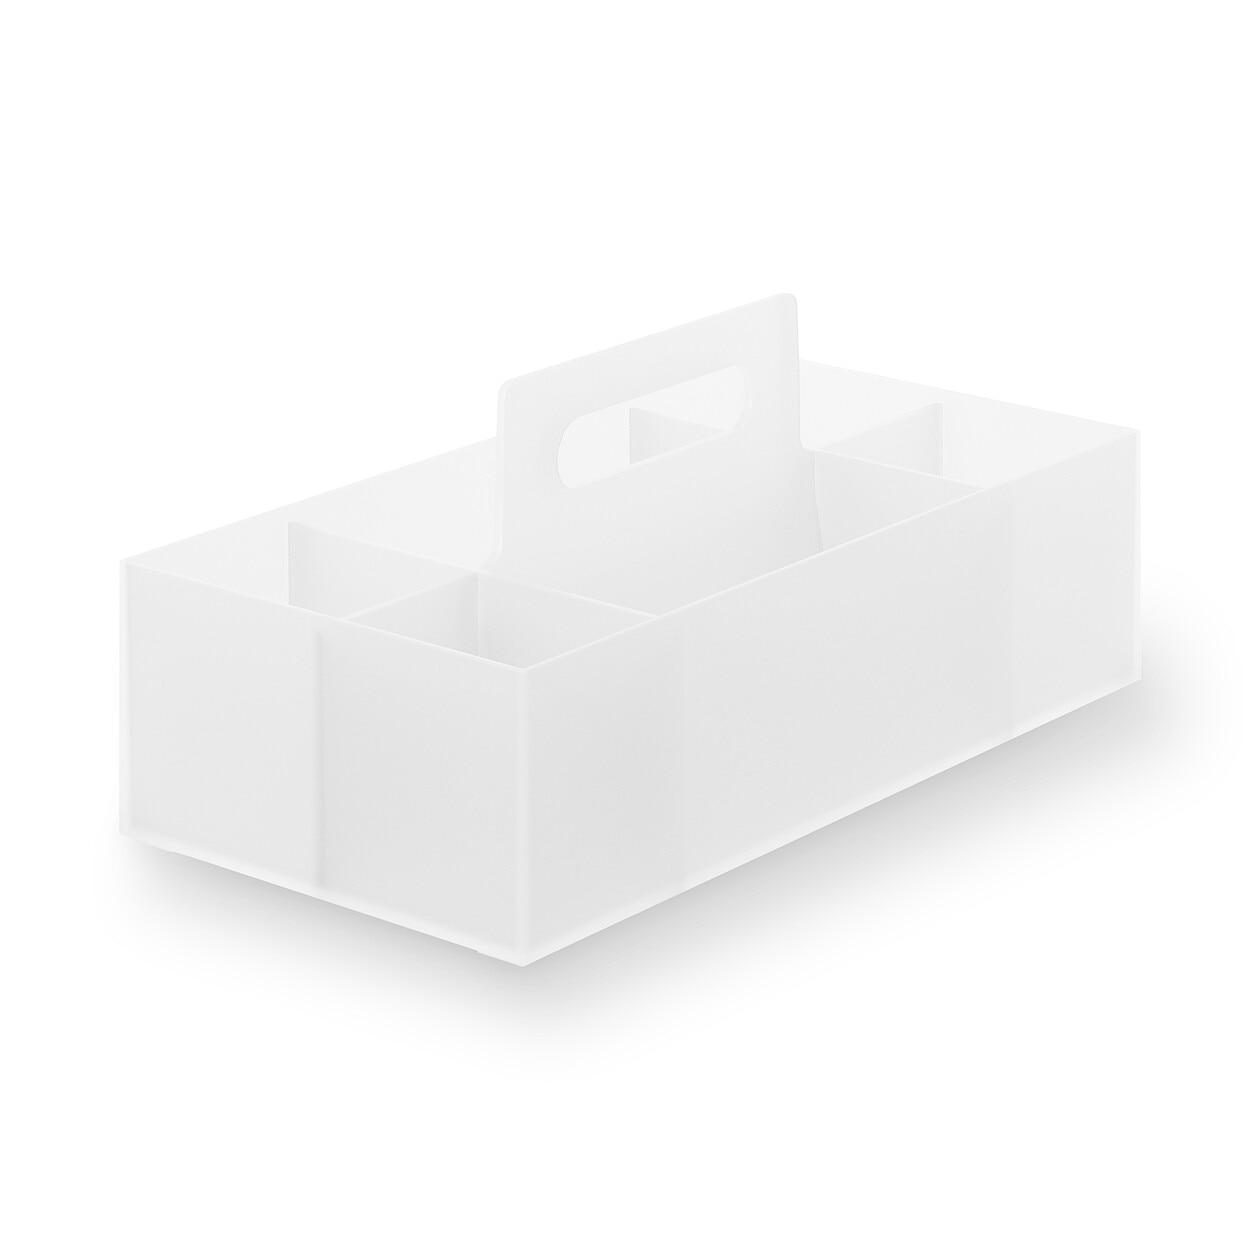 RoomClip商品情報 - ポリプロピレン収納キャリーボックス・ワイド